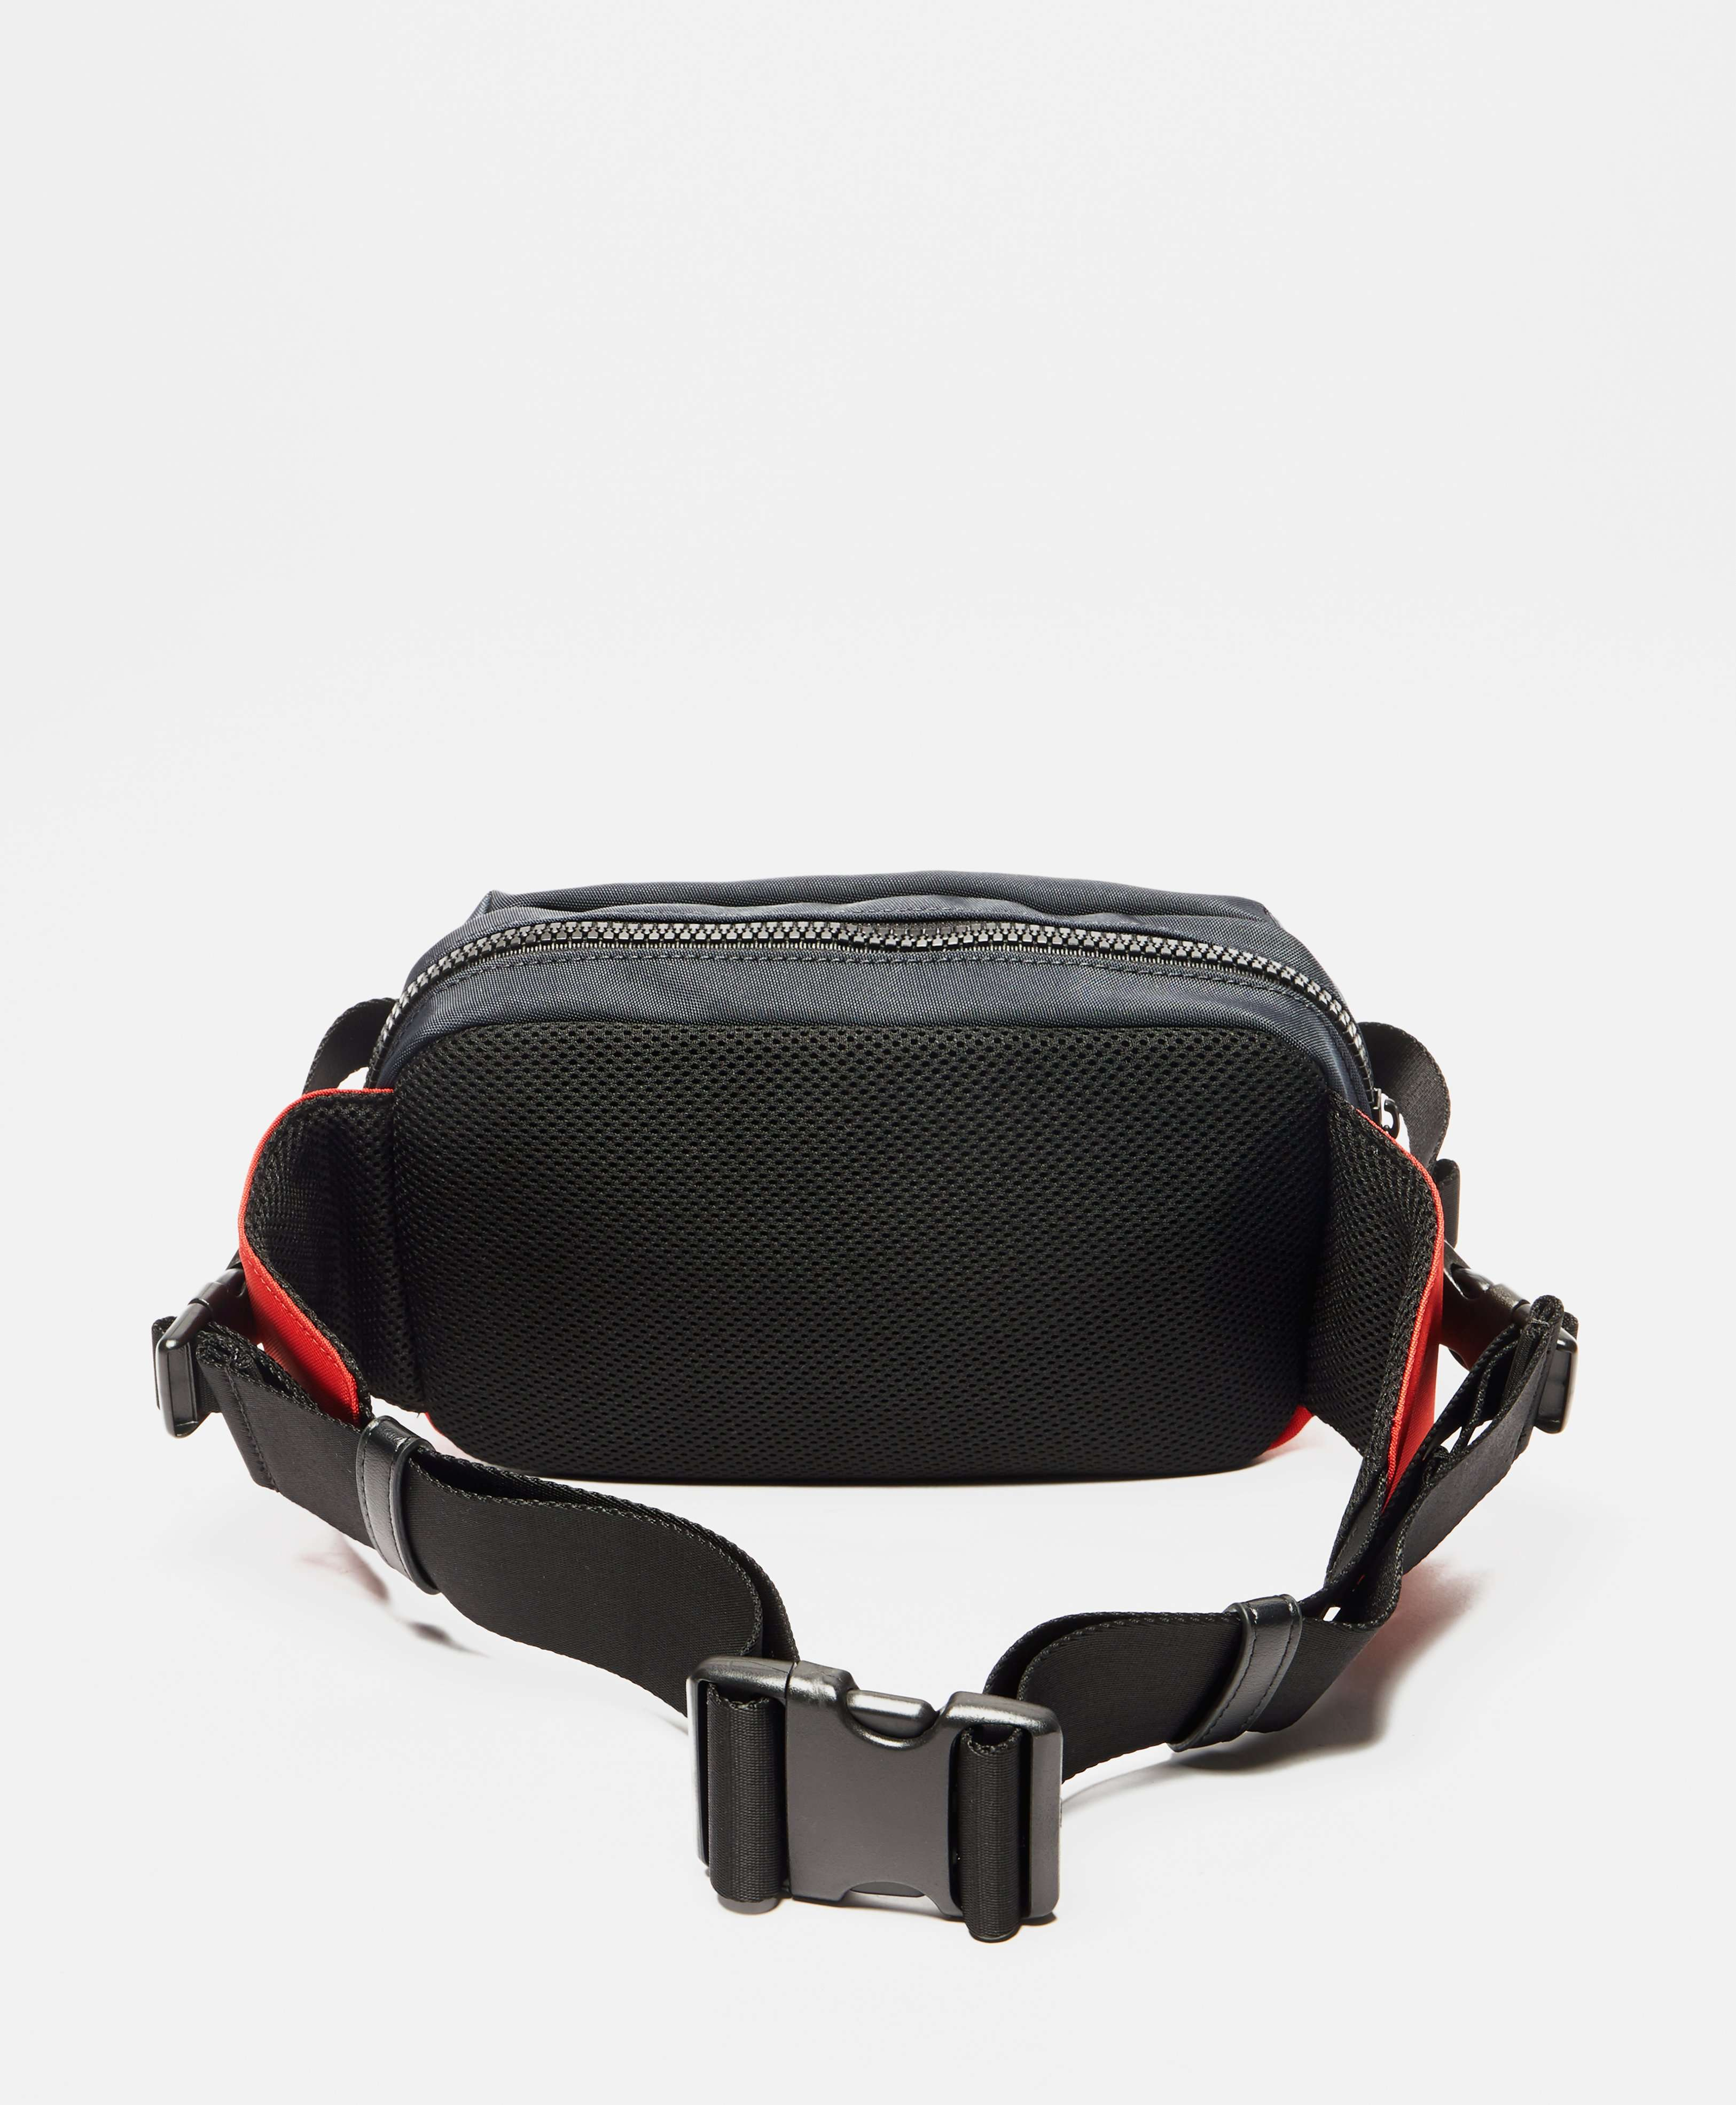 Tommy Hilfiger Varsity Cross Body Bag